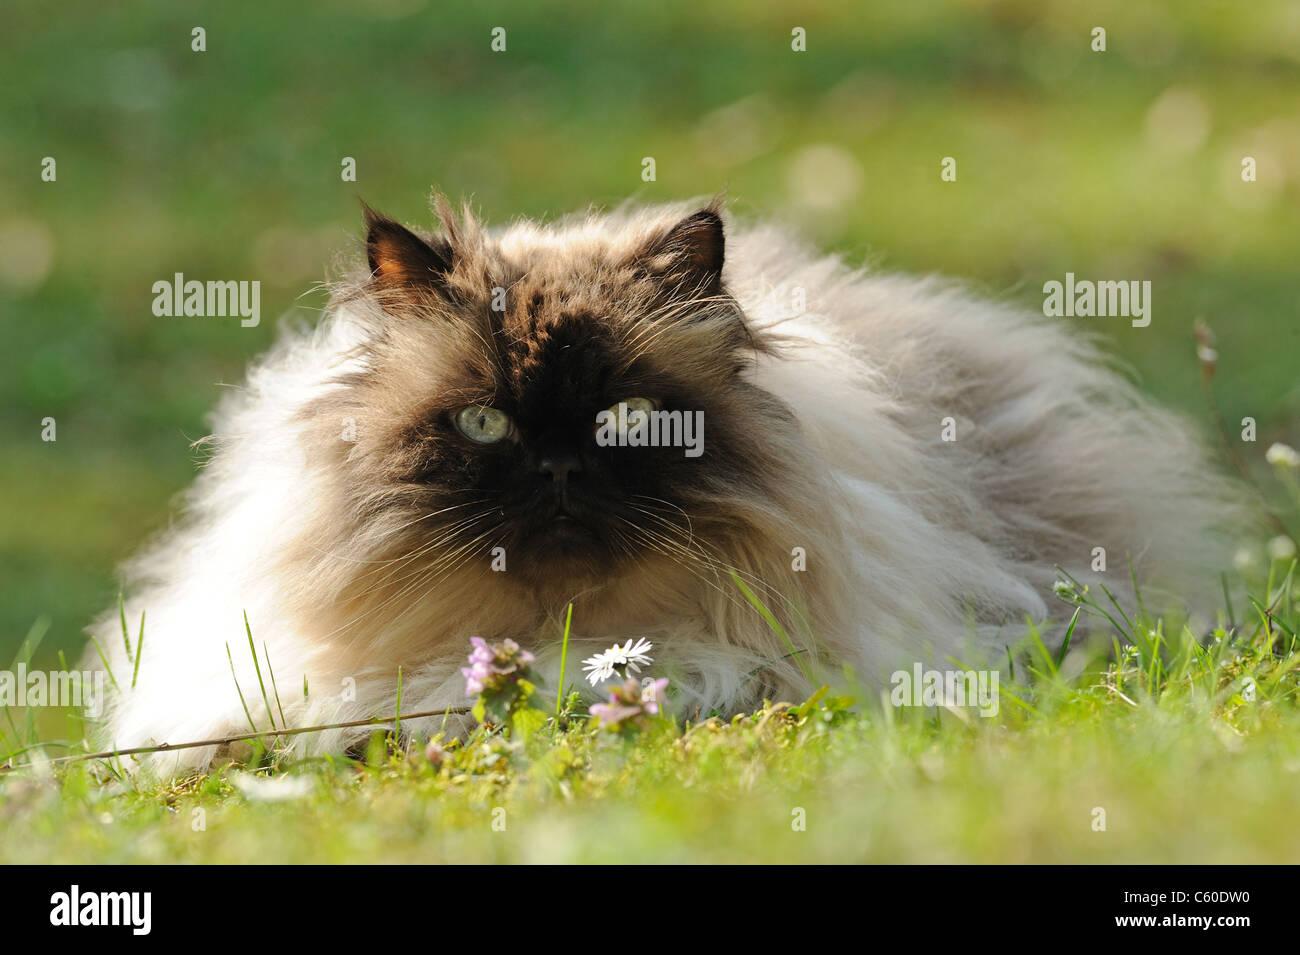 Domestic Cat, Persian Cat (Felis silvestris, Felis catus), adult female lying on a lawn. - Stock Image